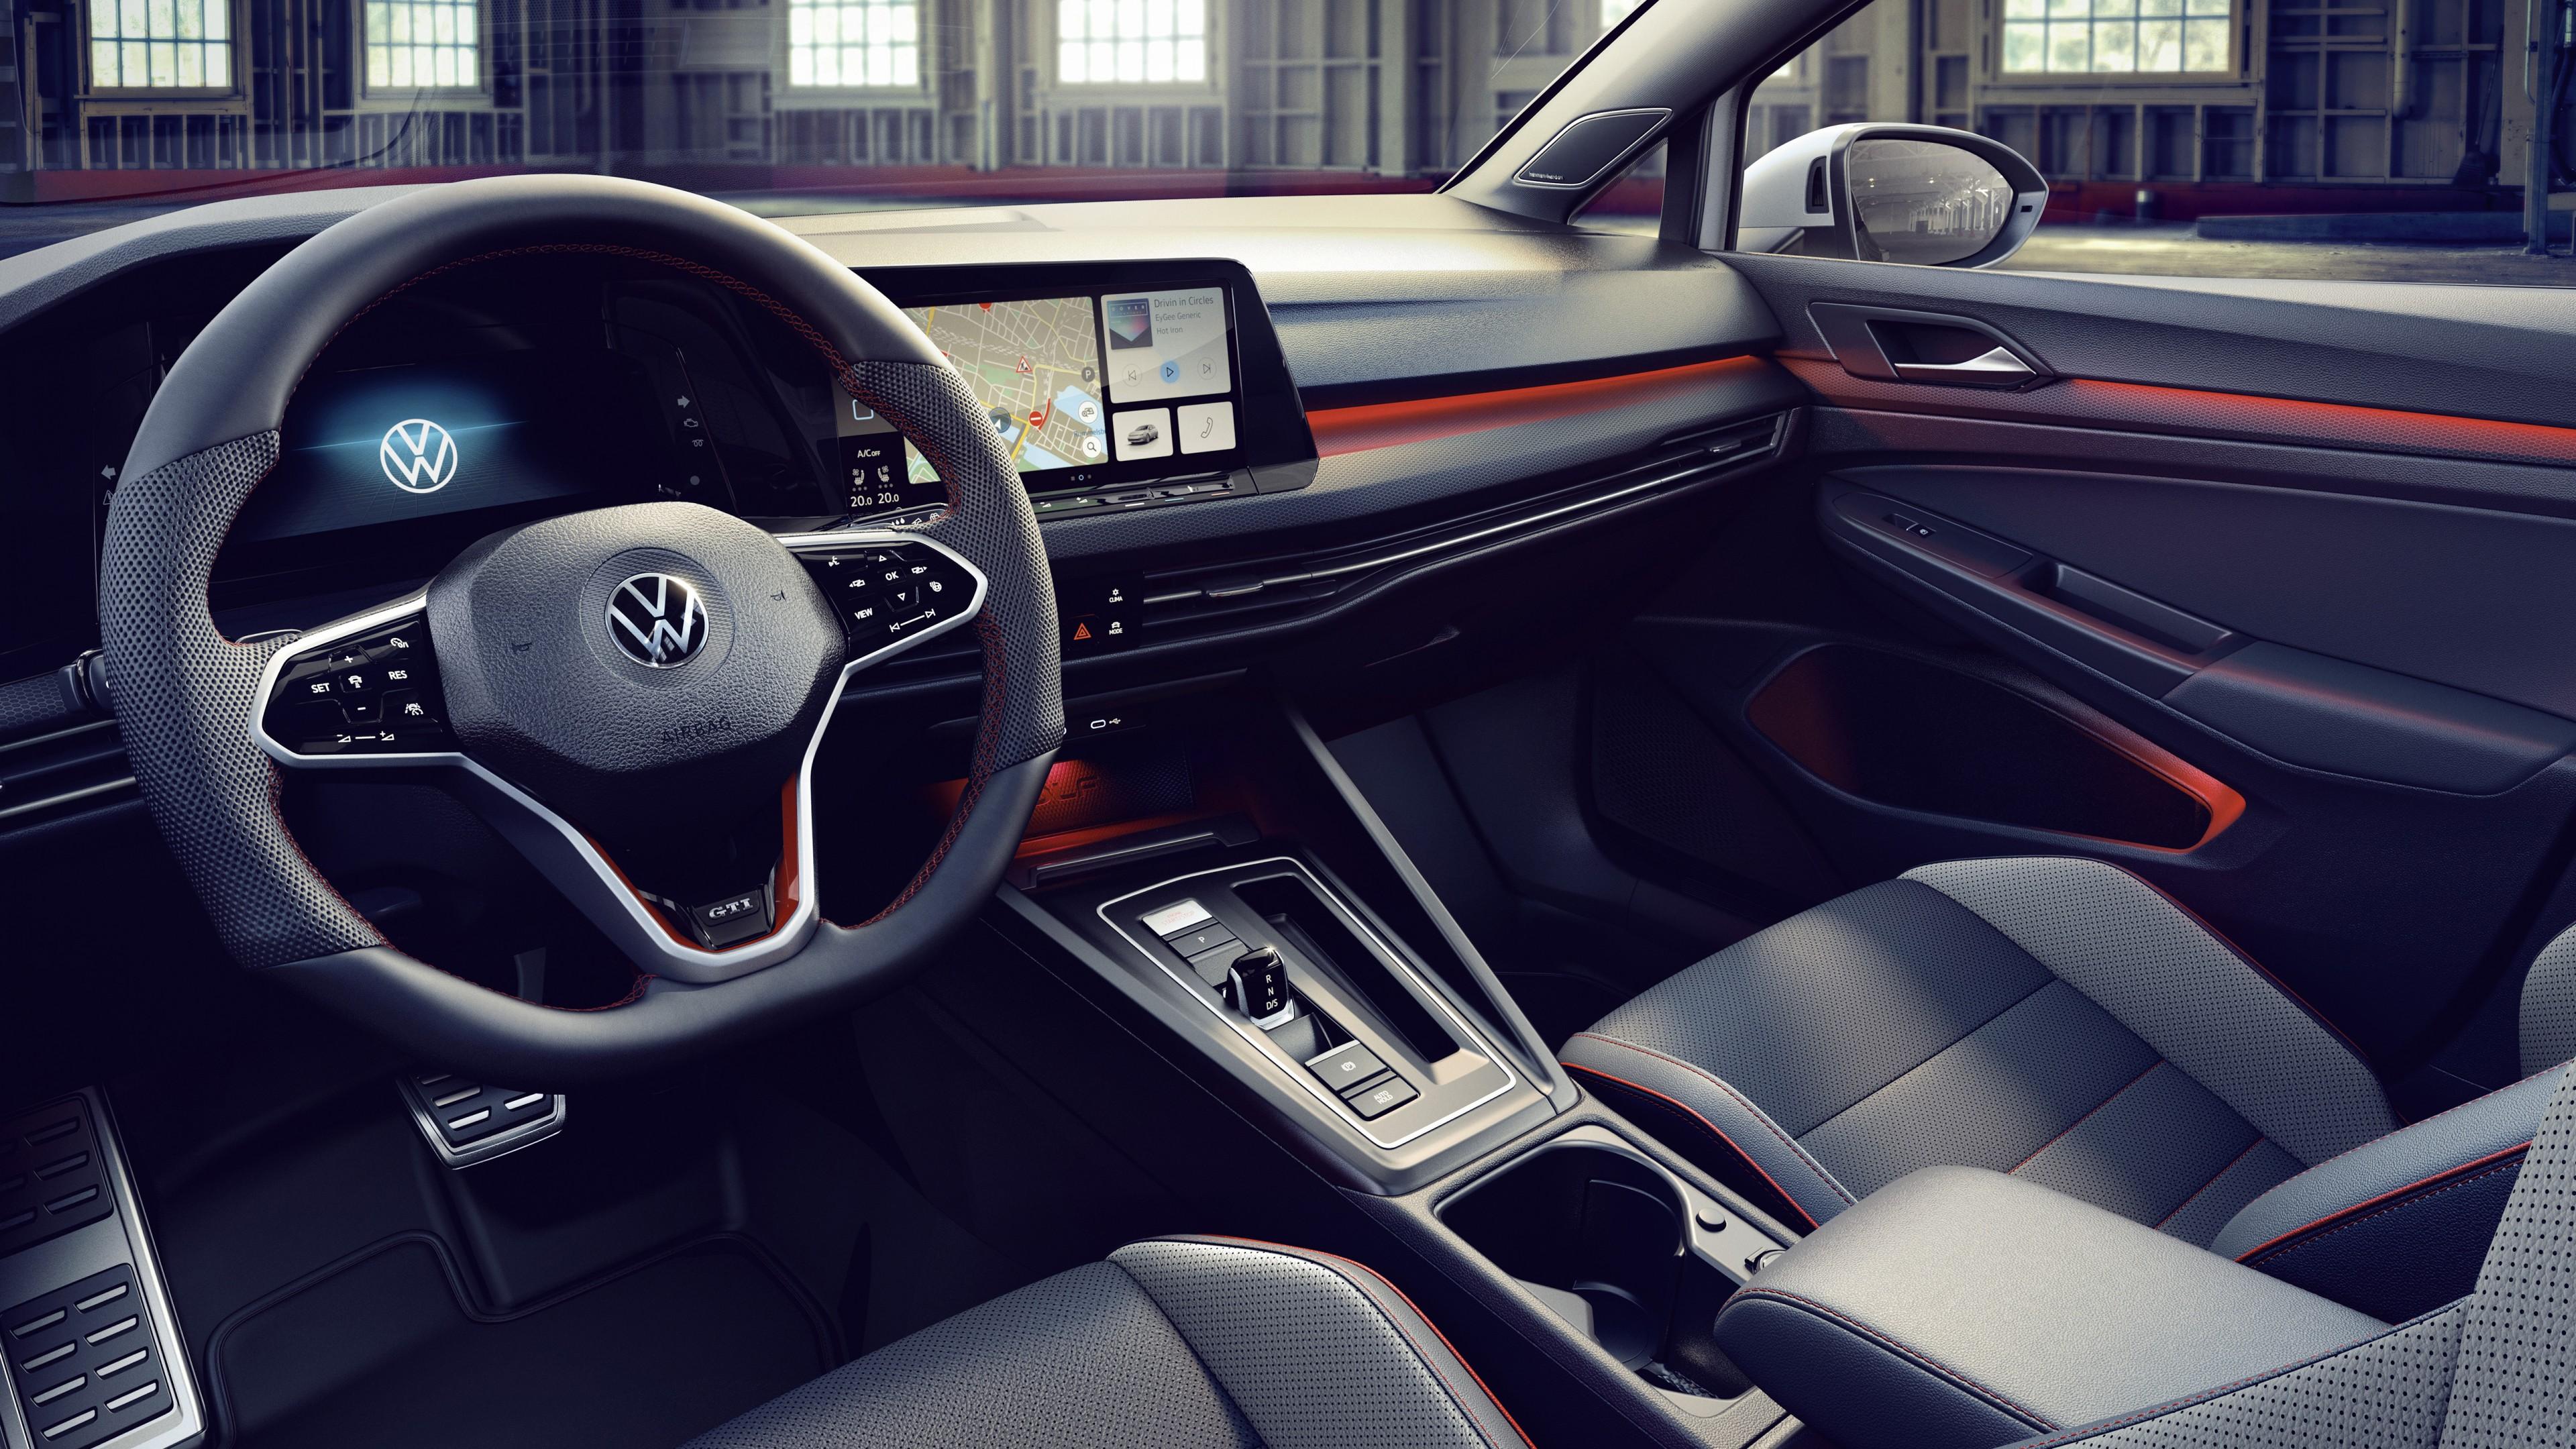 Volkswagen Golf GTI Clubsport 2020 5K Interior Wallpaper ...